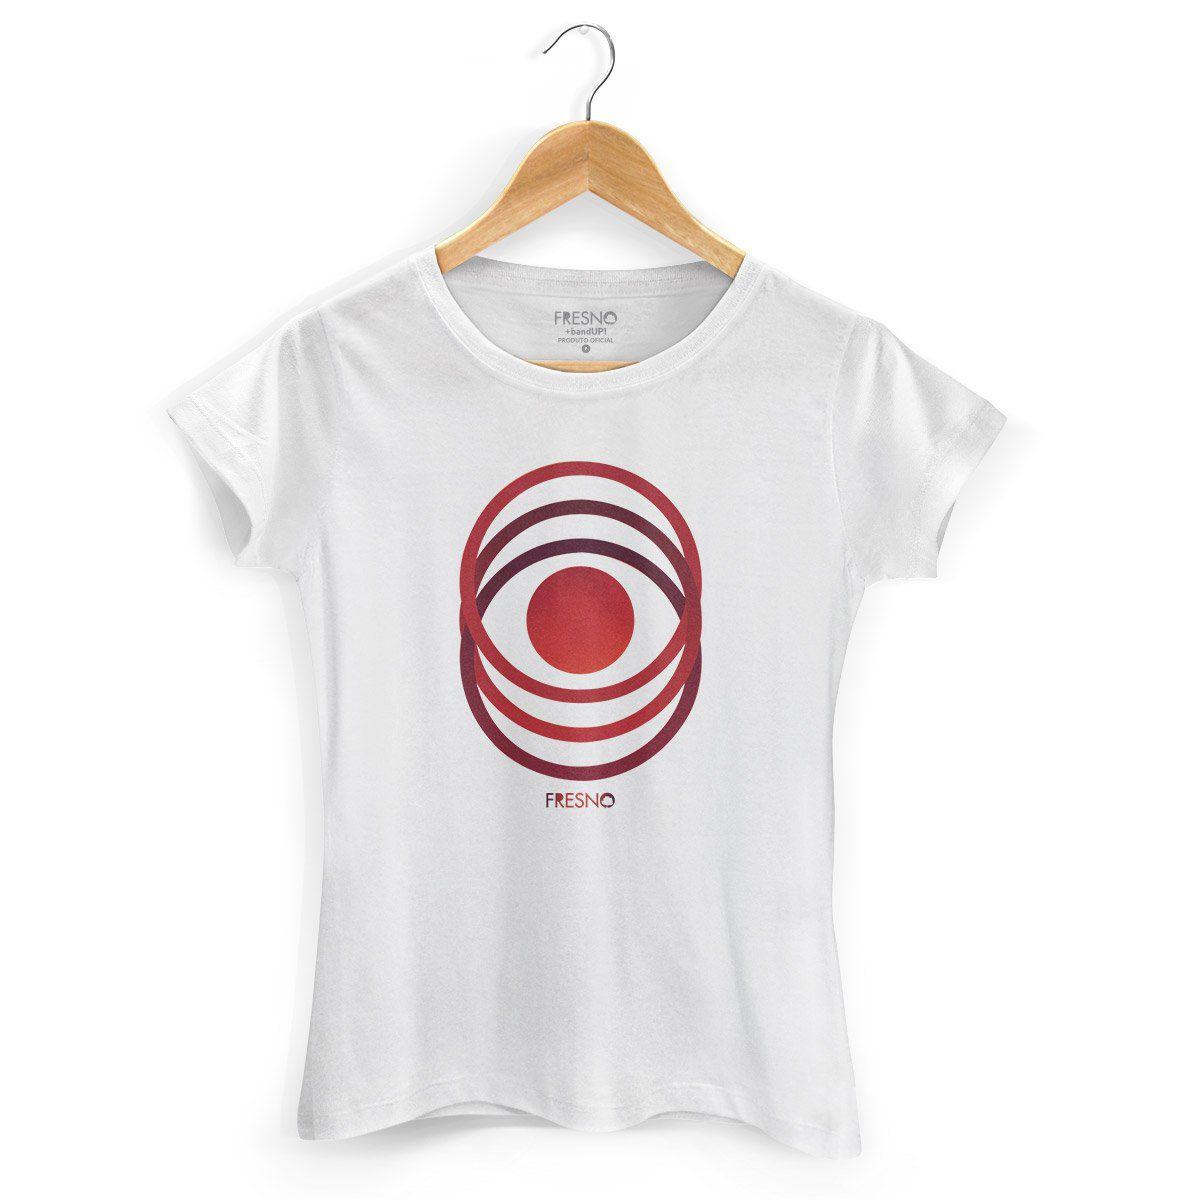 Camiseta Feminina Fresno Olho